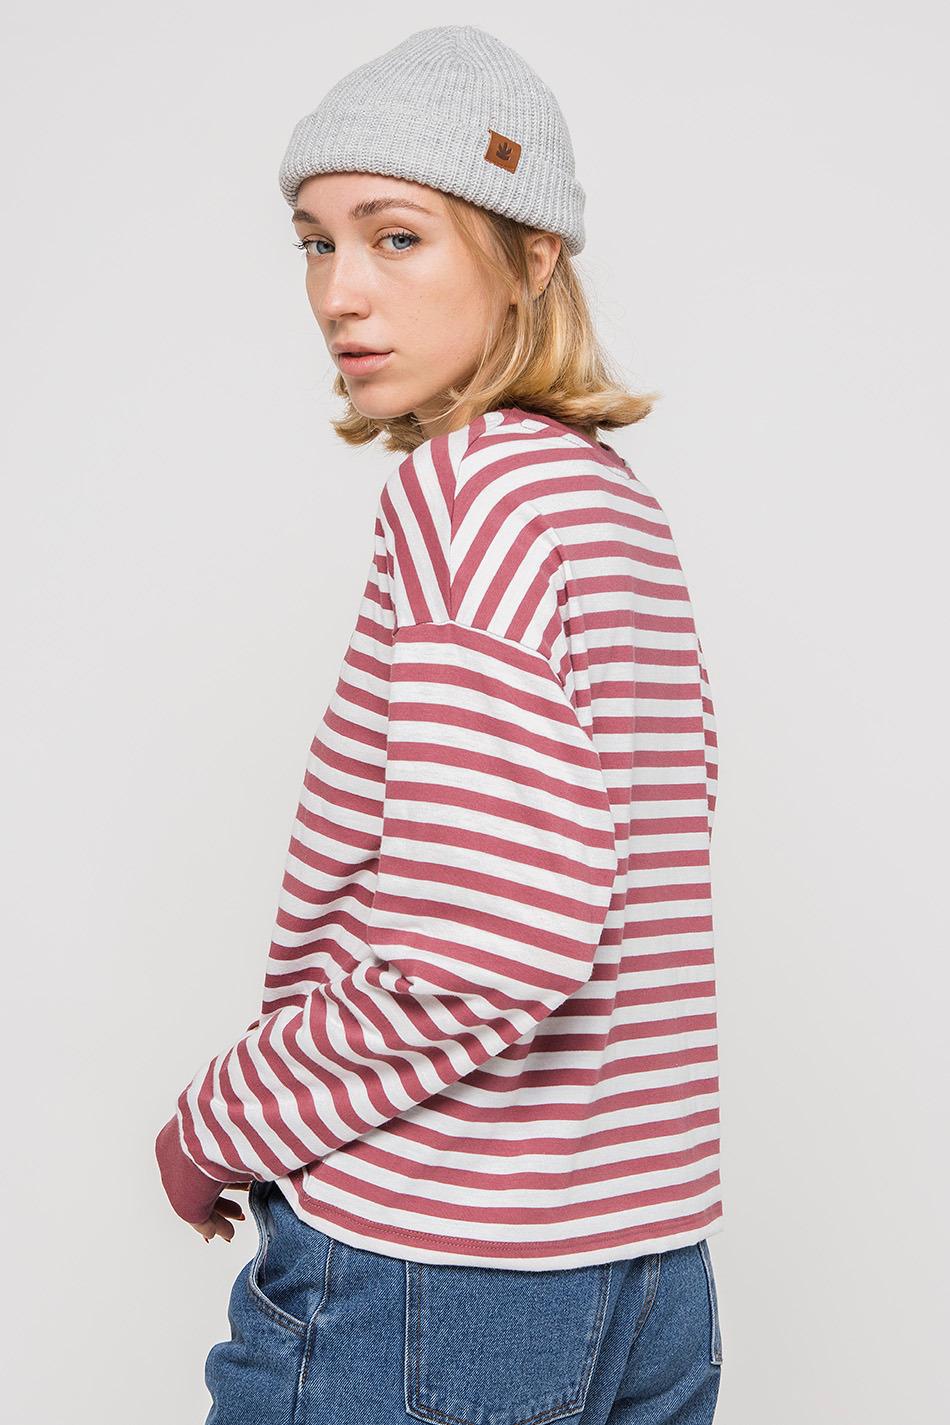 Camiseta Stripe Burgundy Heart